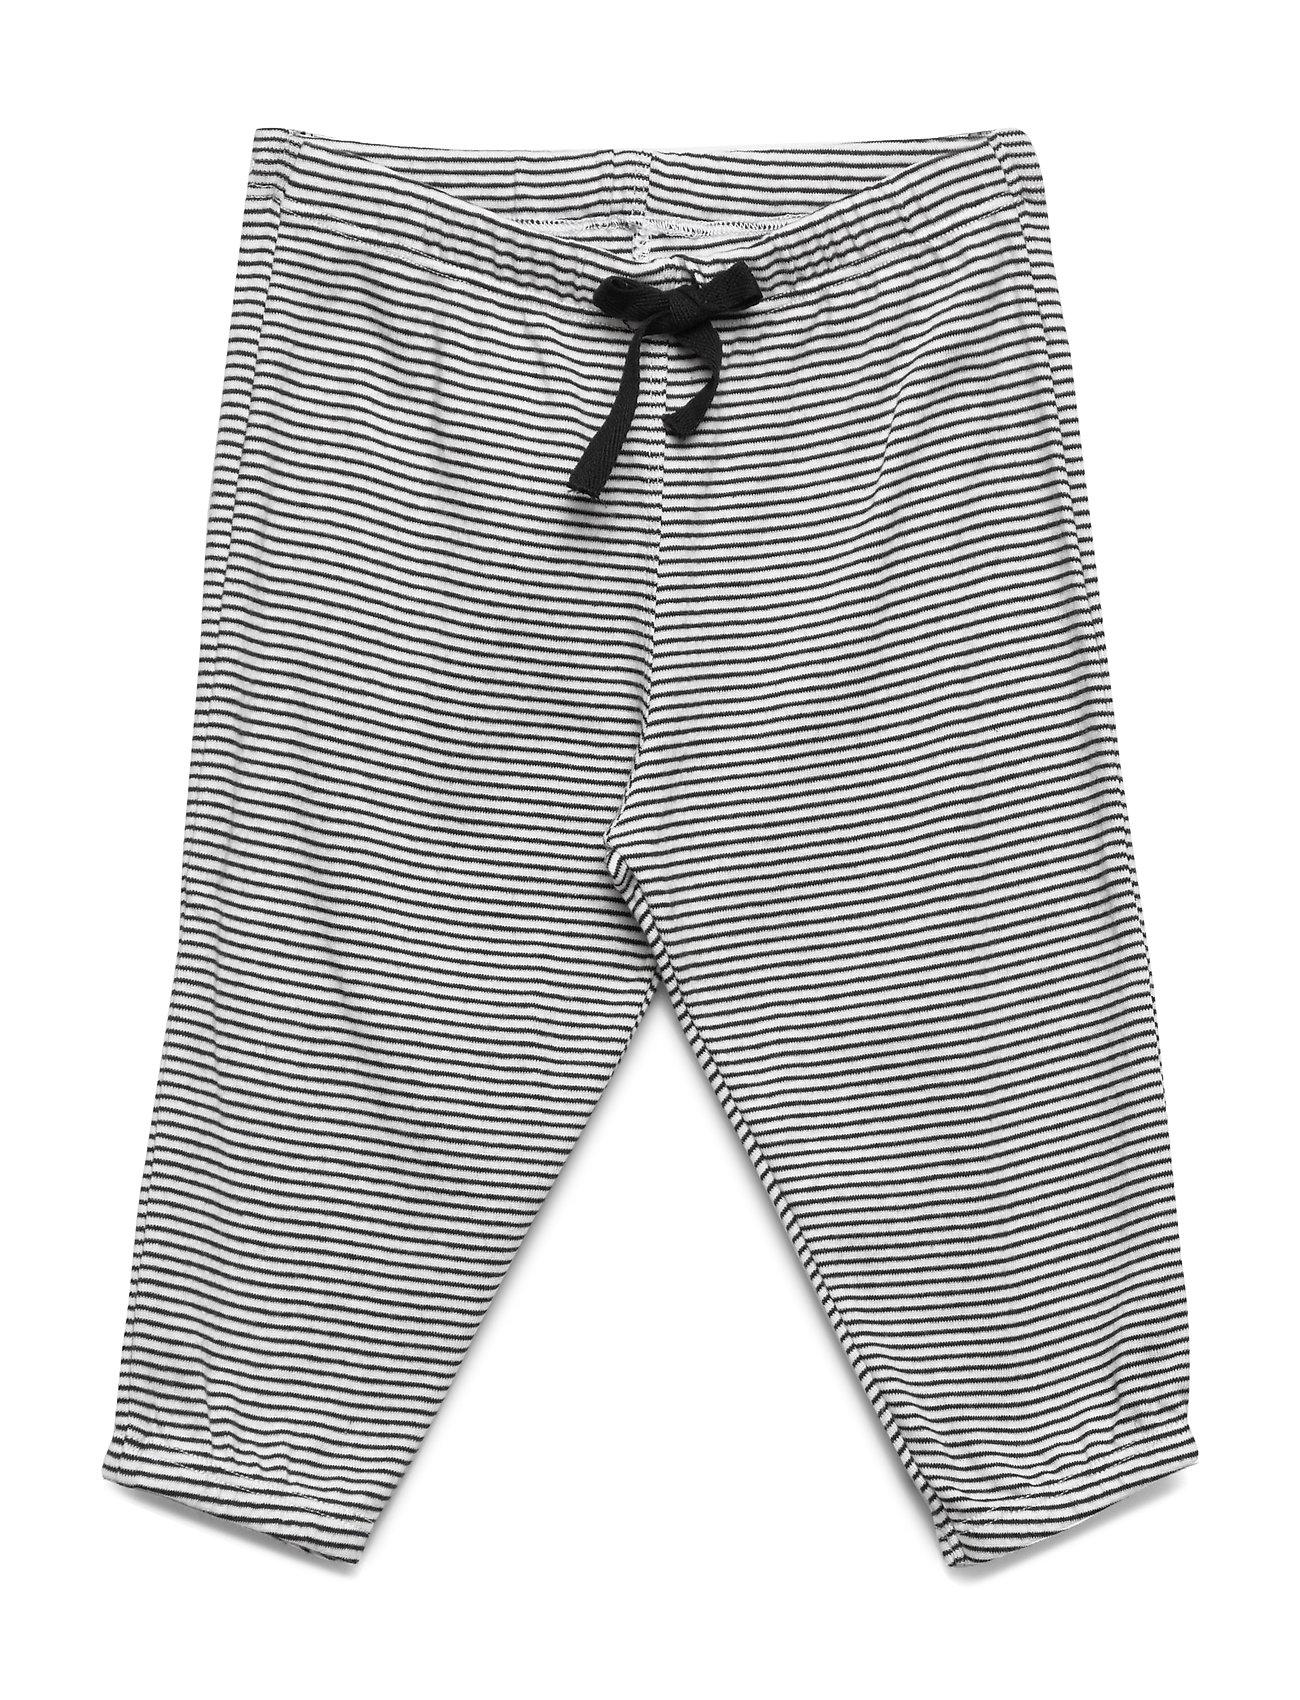 Noa Noa Miniature Trousers - BLACK